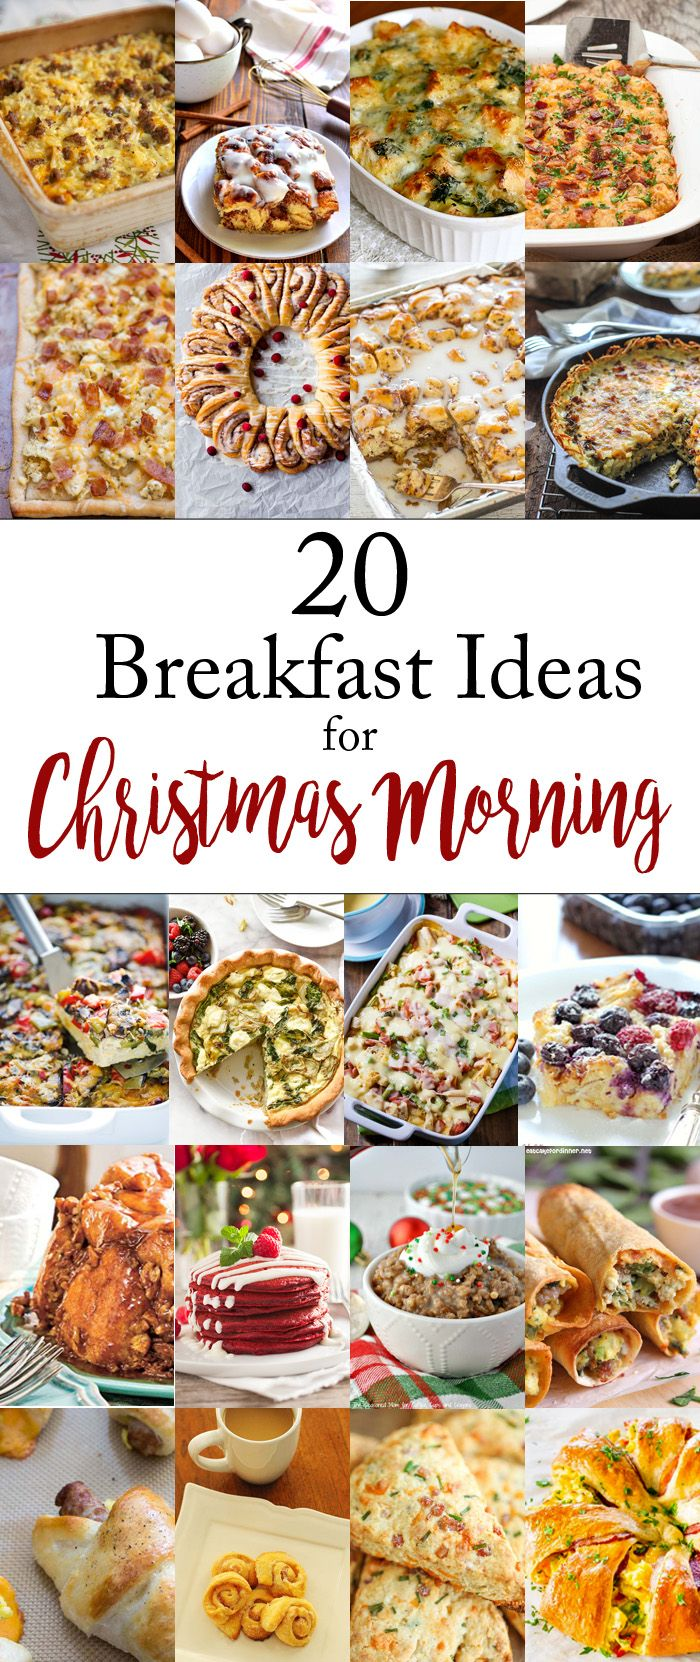 Christmas Morning Breakfast Ideas.Christmas Morning Brunch Ideas Recipes Christmas Brunch